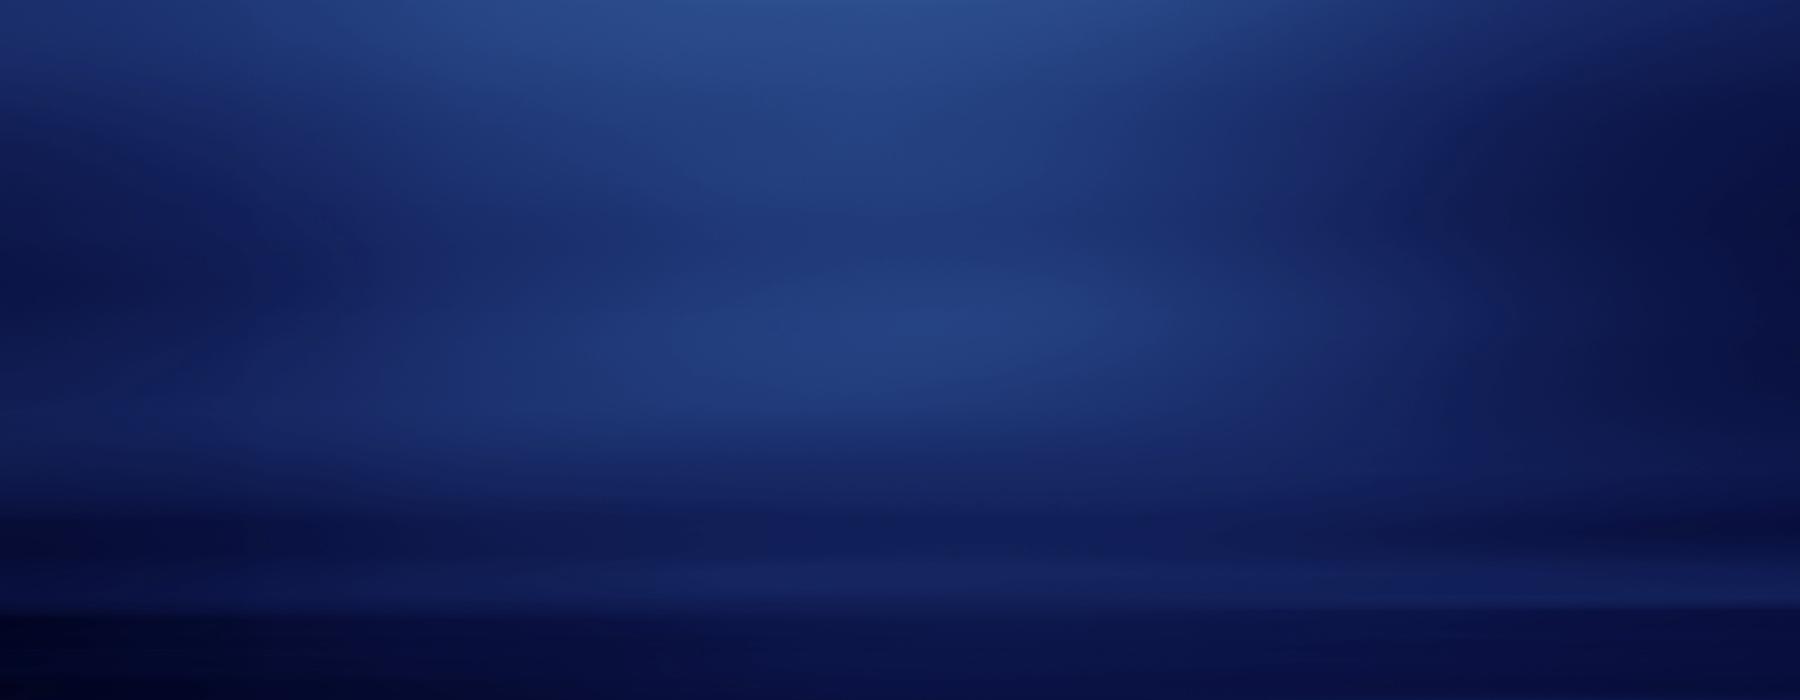 Blue Banner Background: Sanitation Conversation™